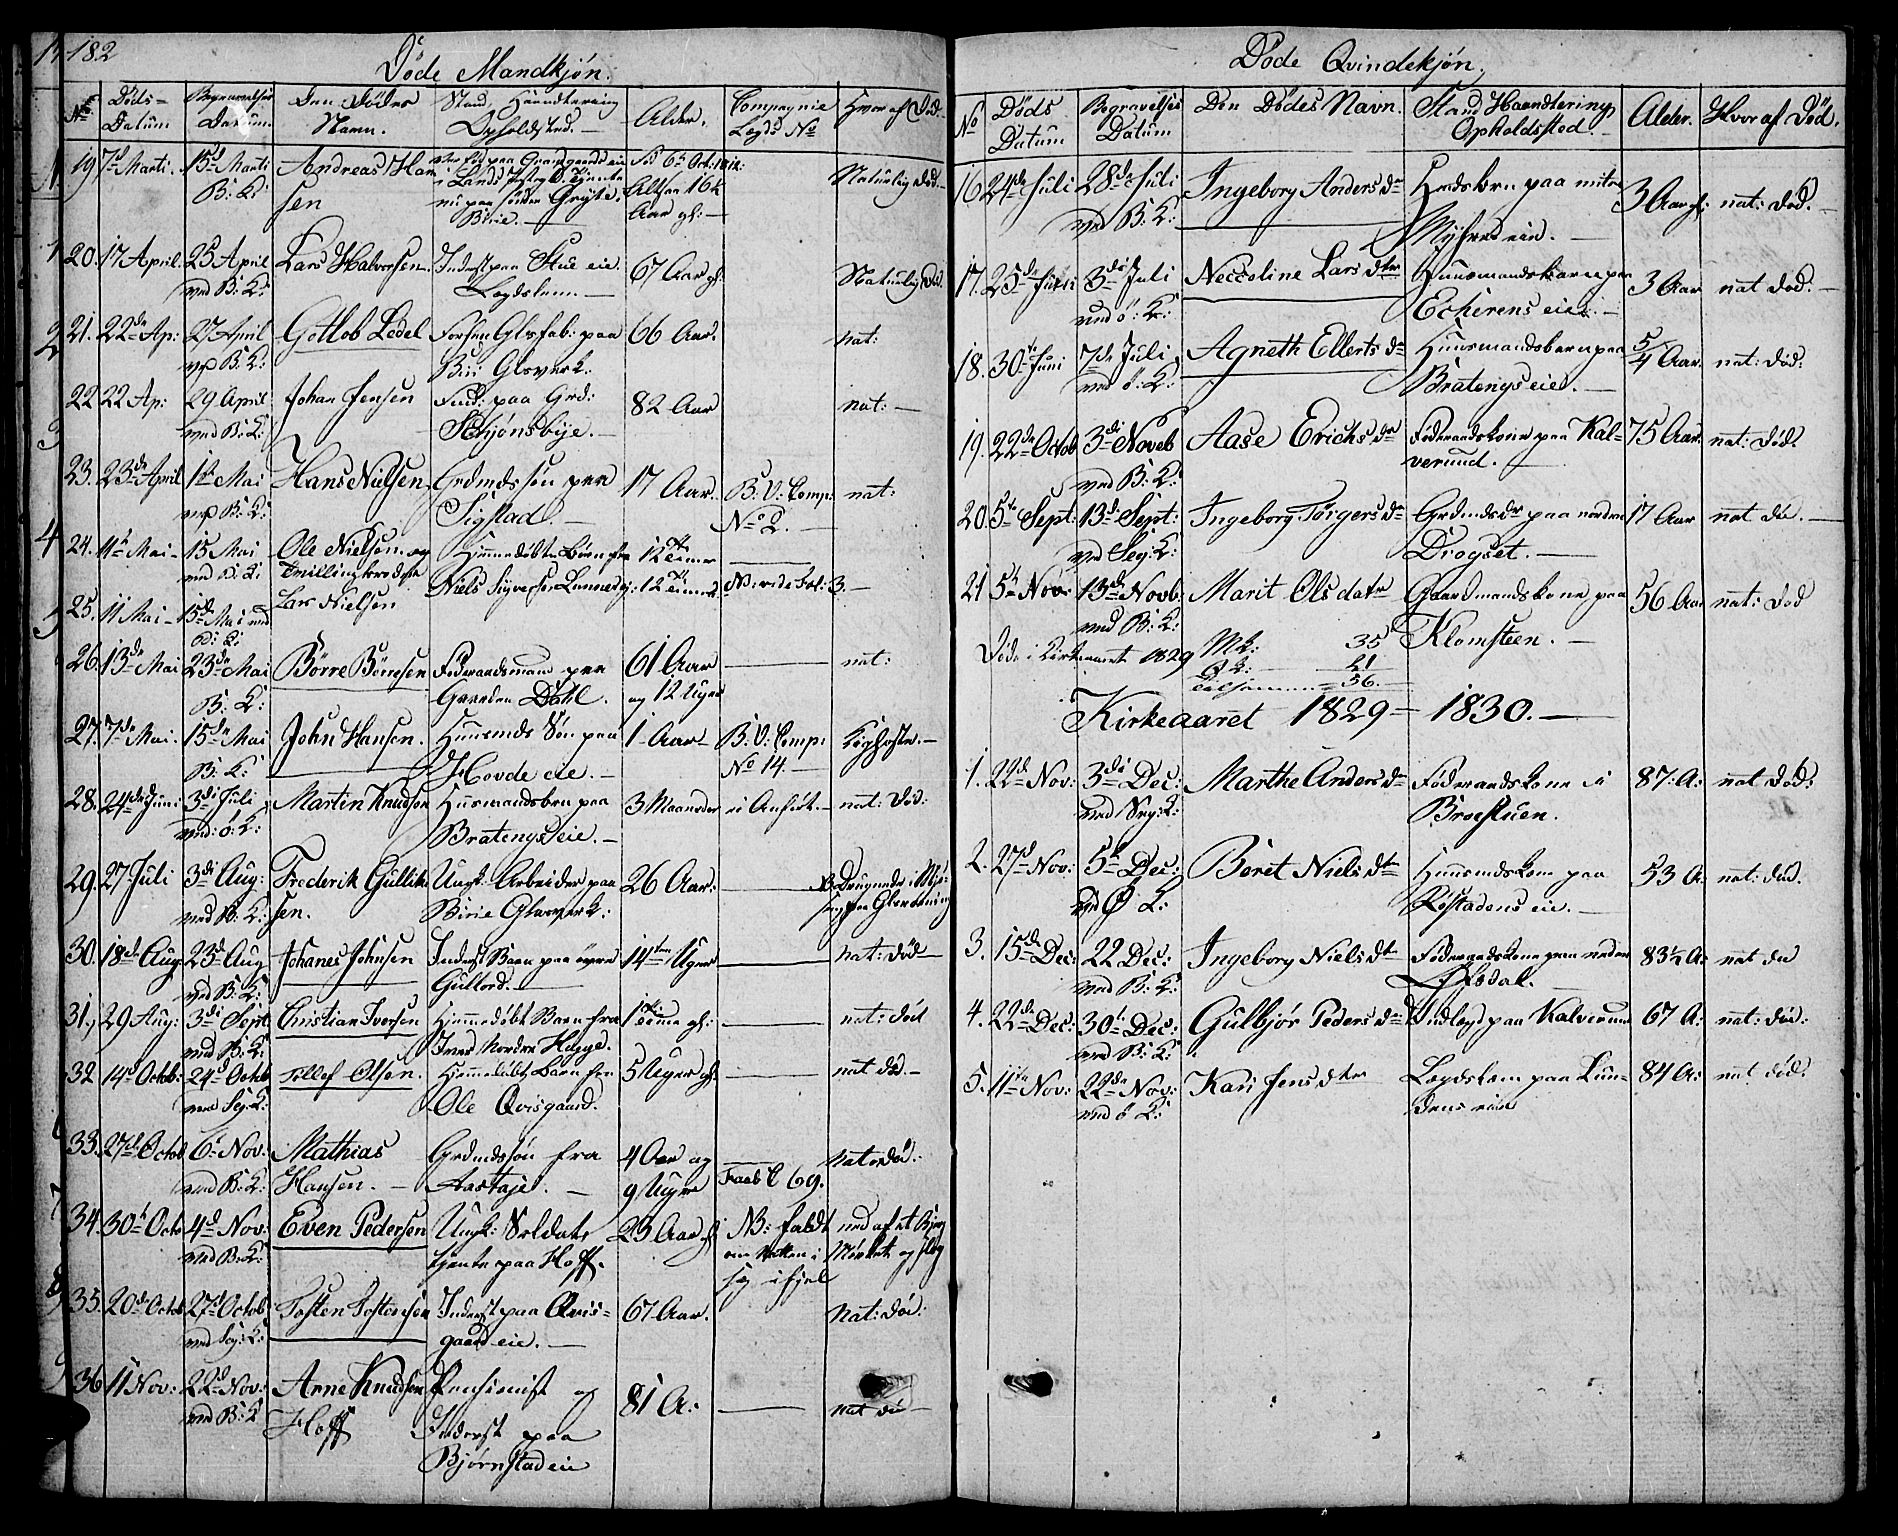 SAH, Biri prestekontor, Klokkerbok nr. 2, 1828-1842, s. 182